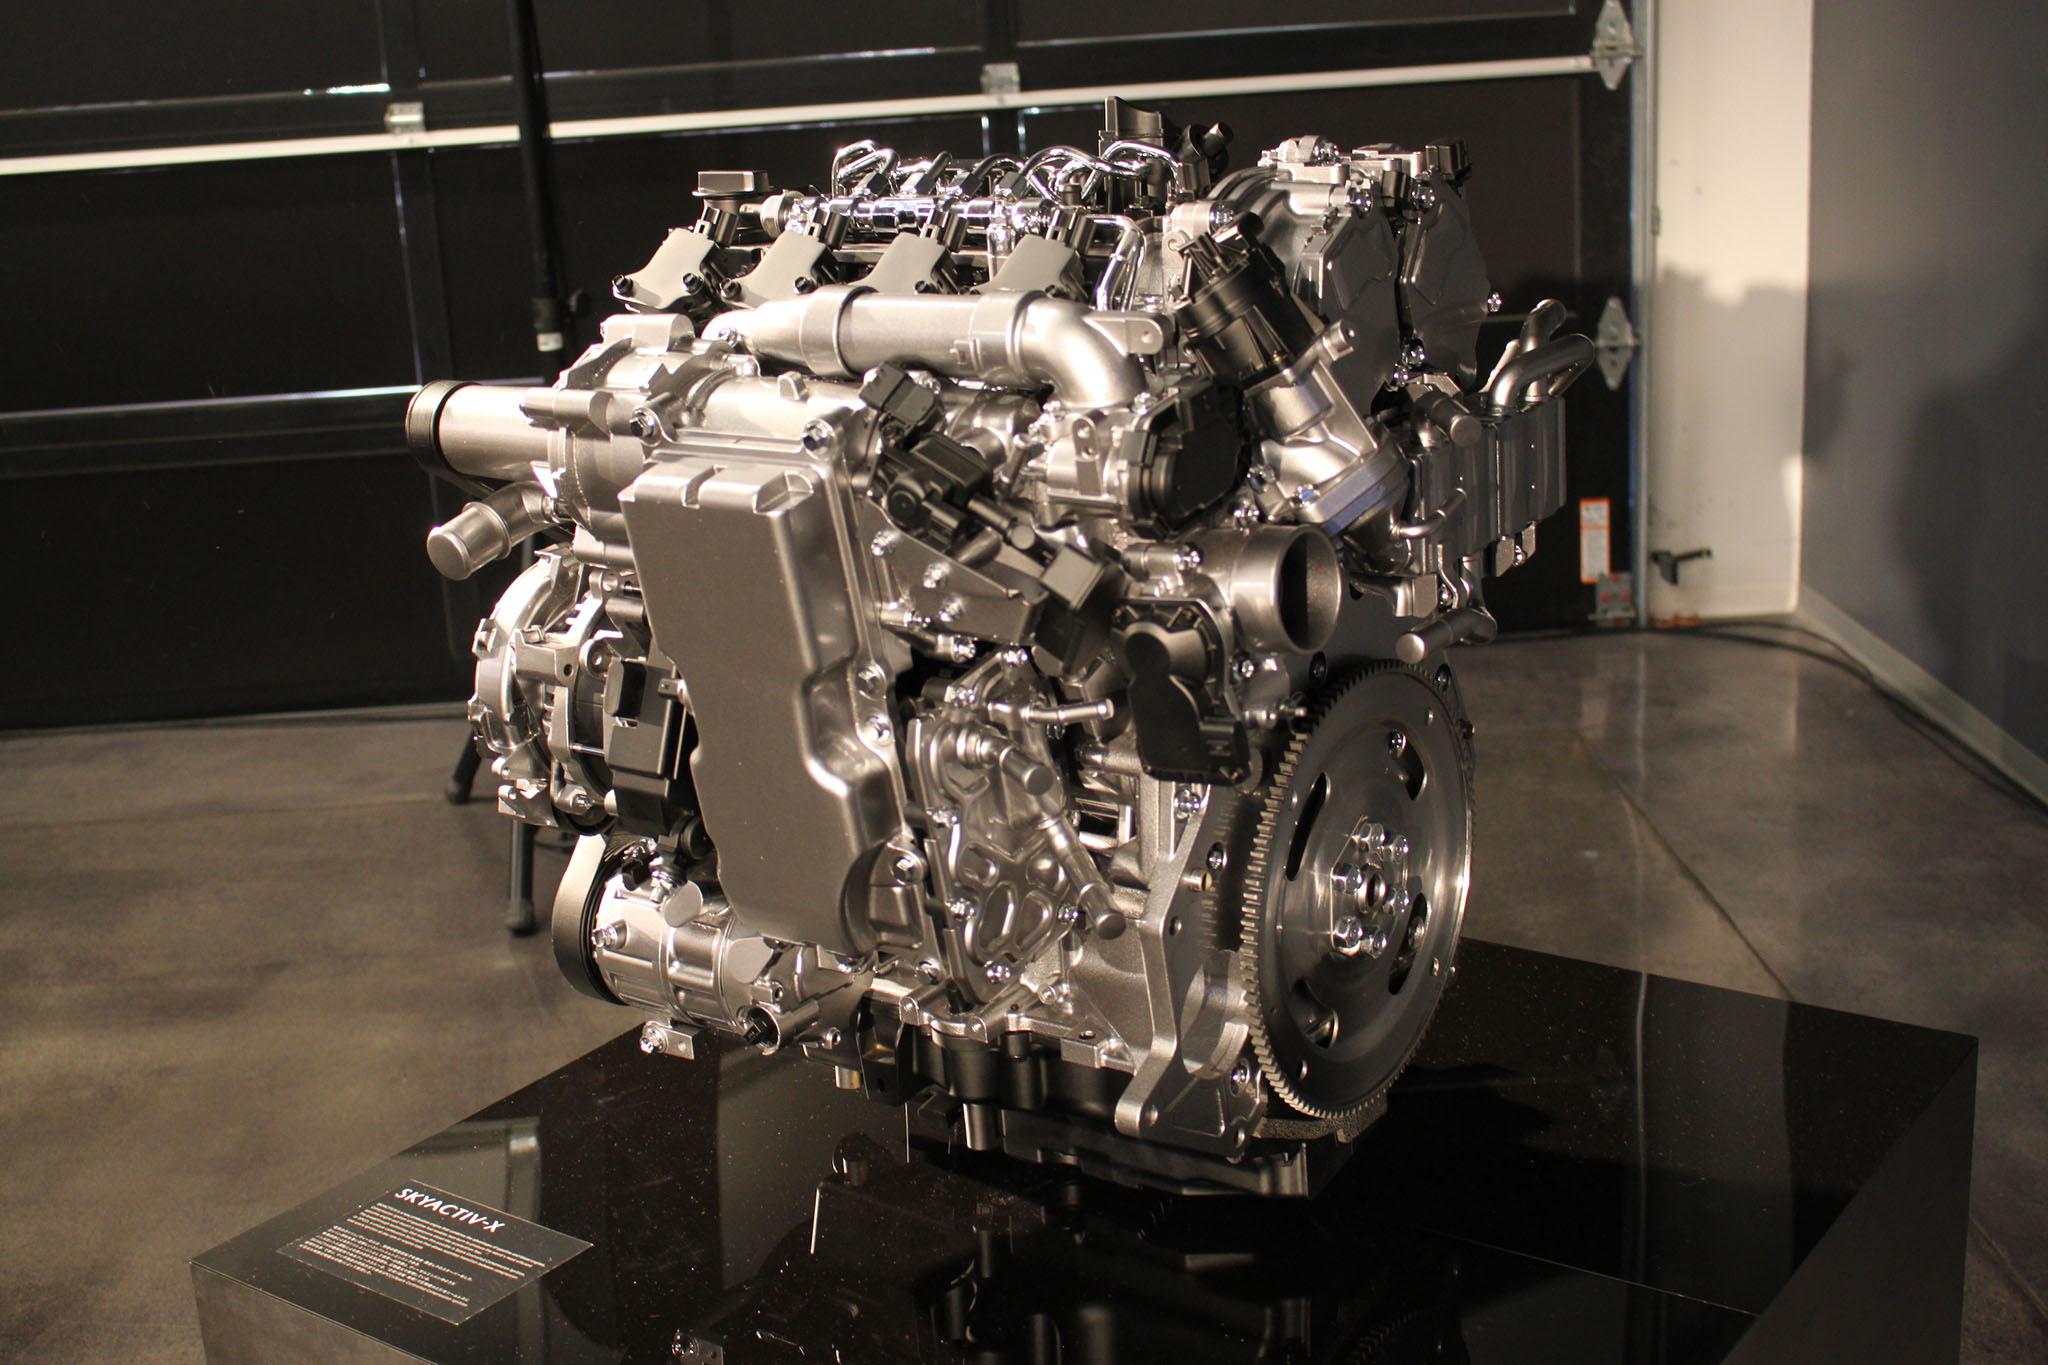 Tinhte_Mazda2.JPG